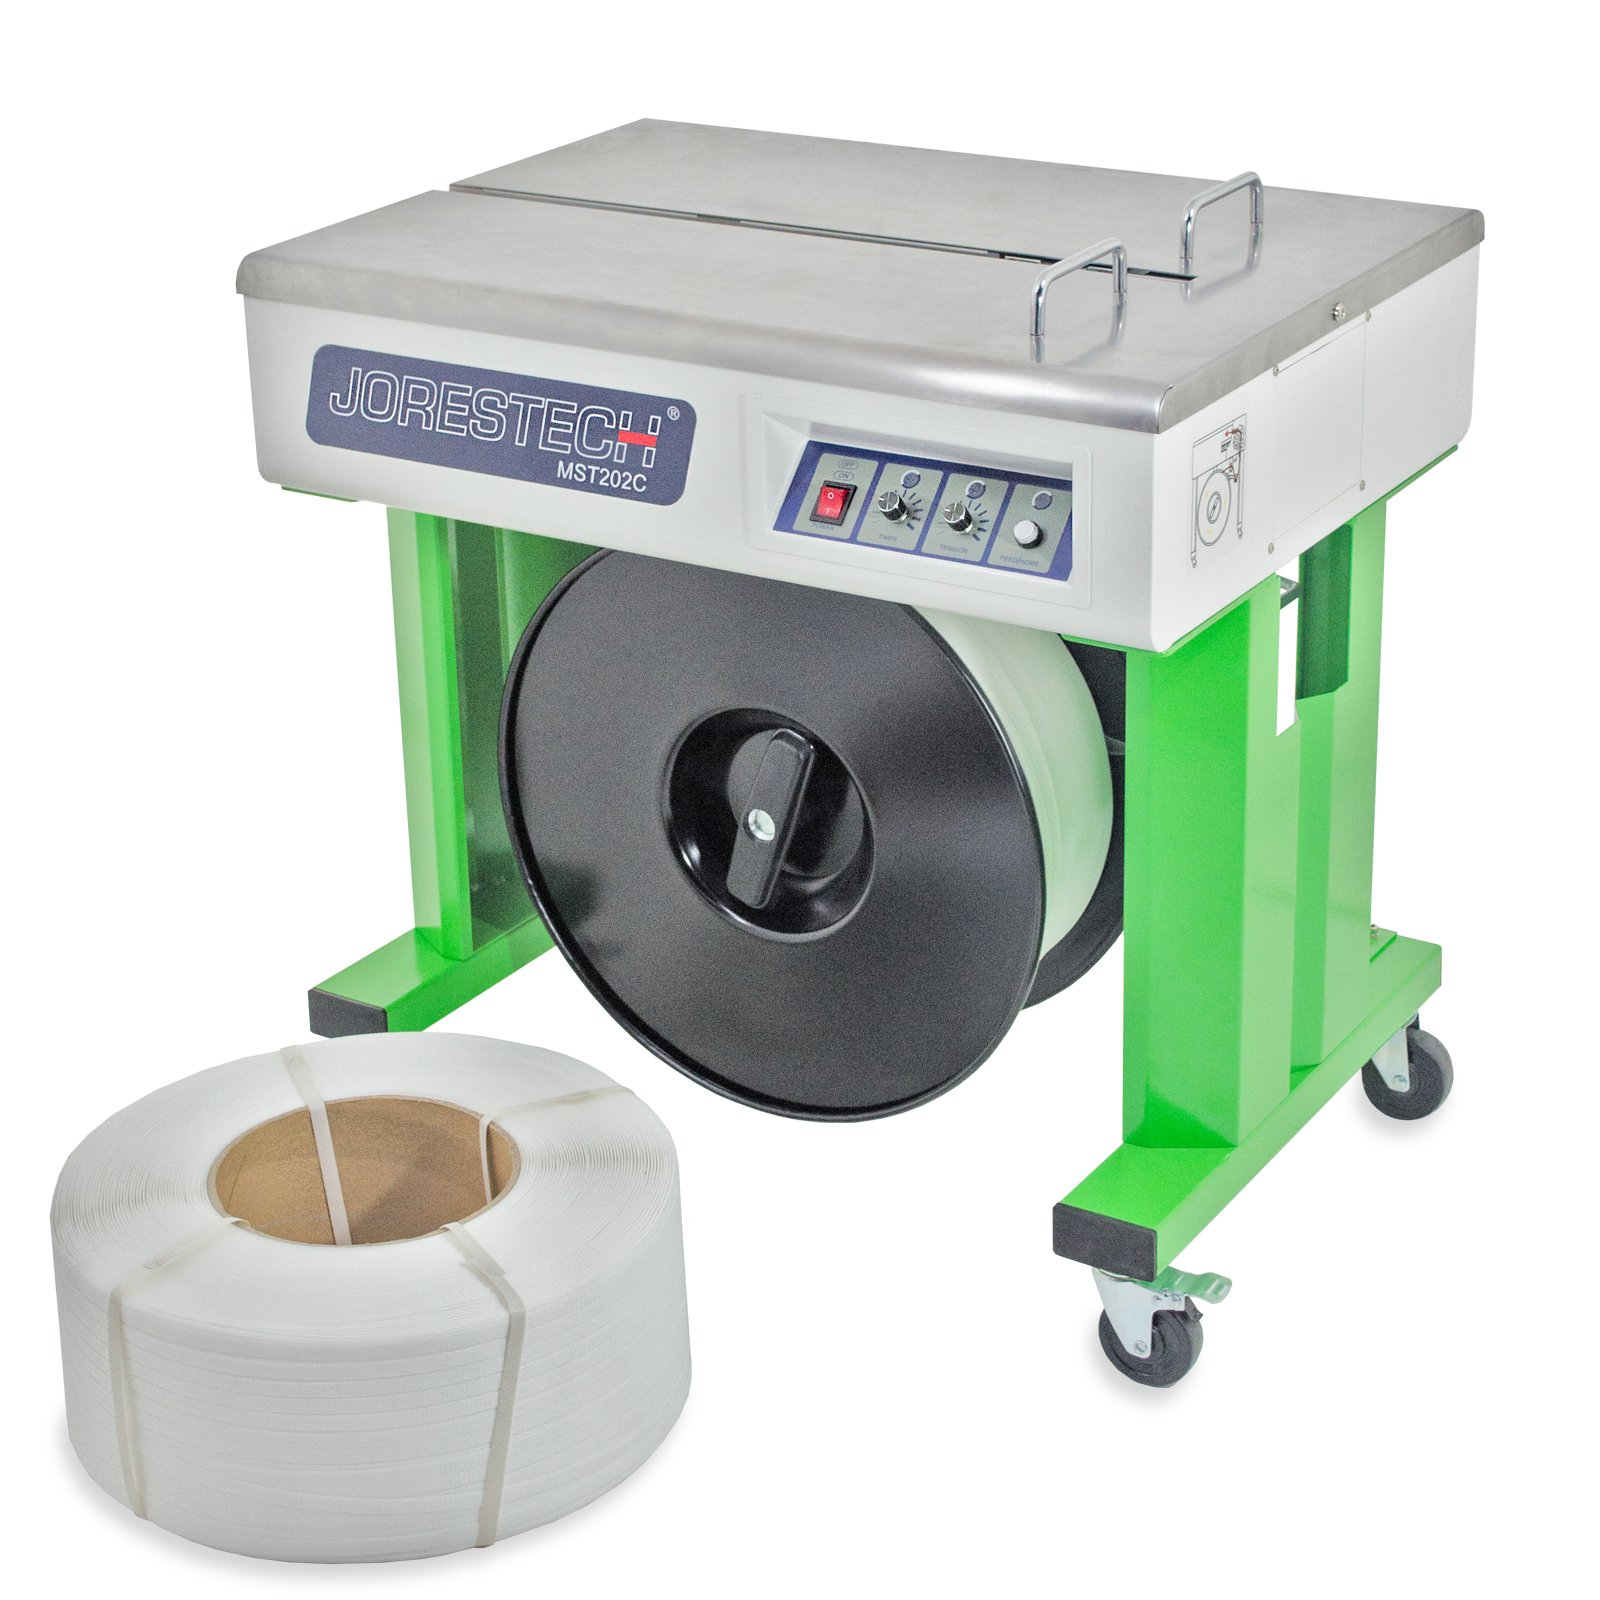 JORESTECH Semi-Automatic Strapping Machine + 2 Coils Free